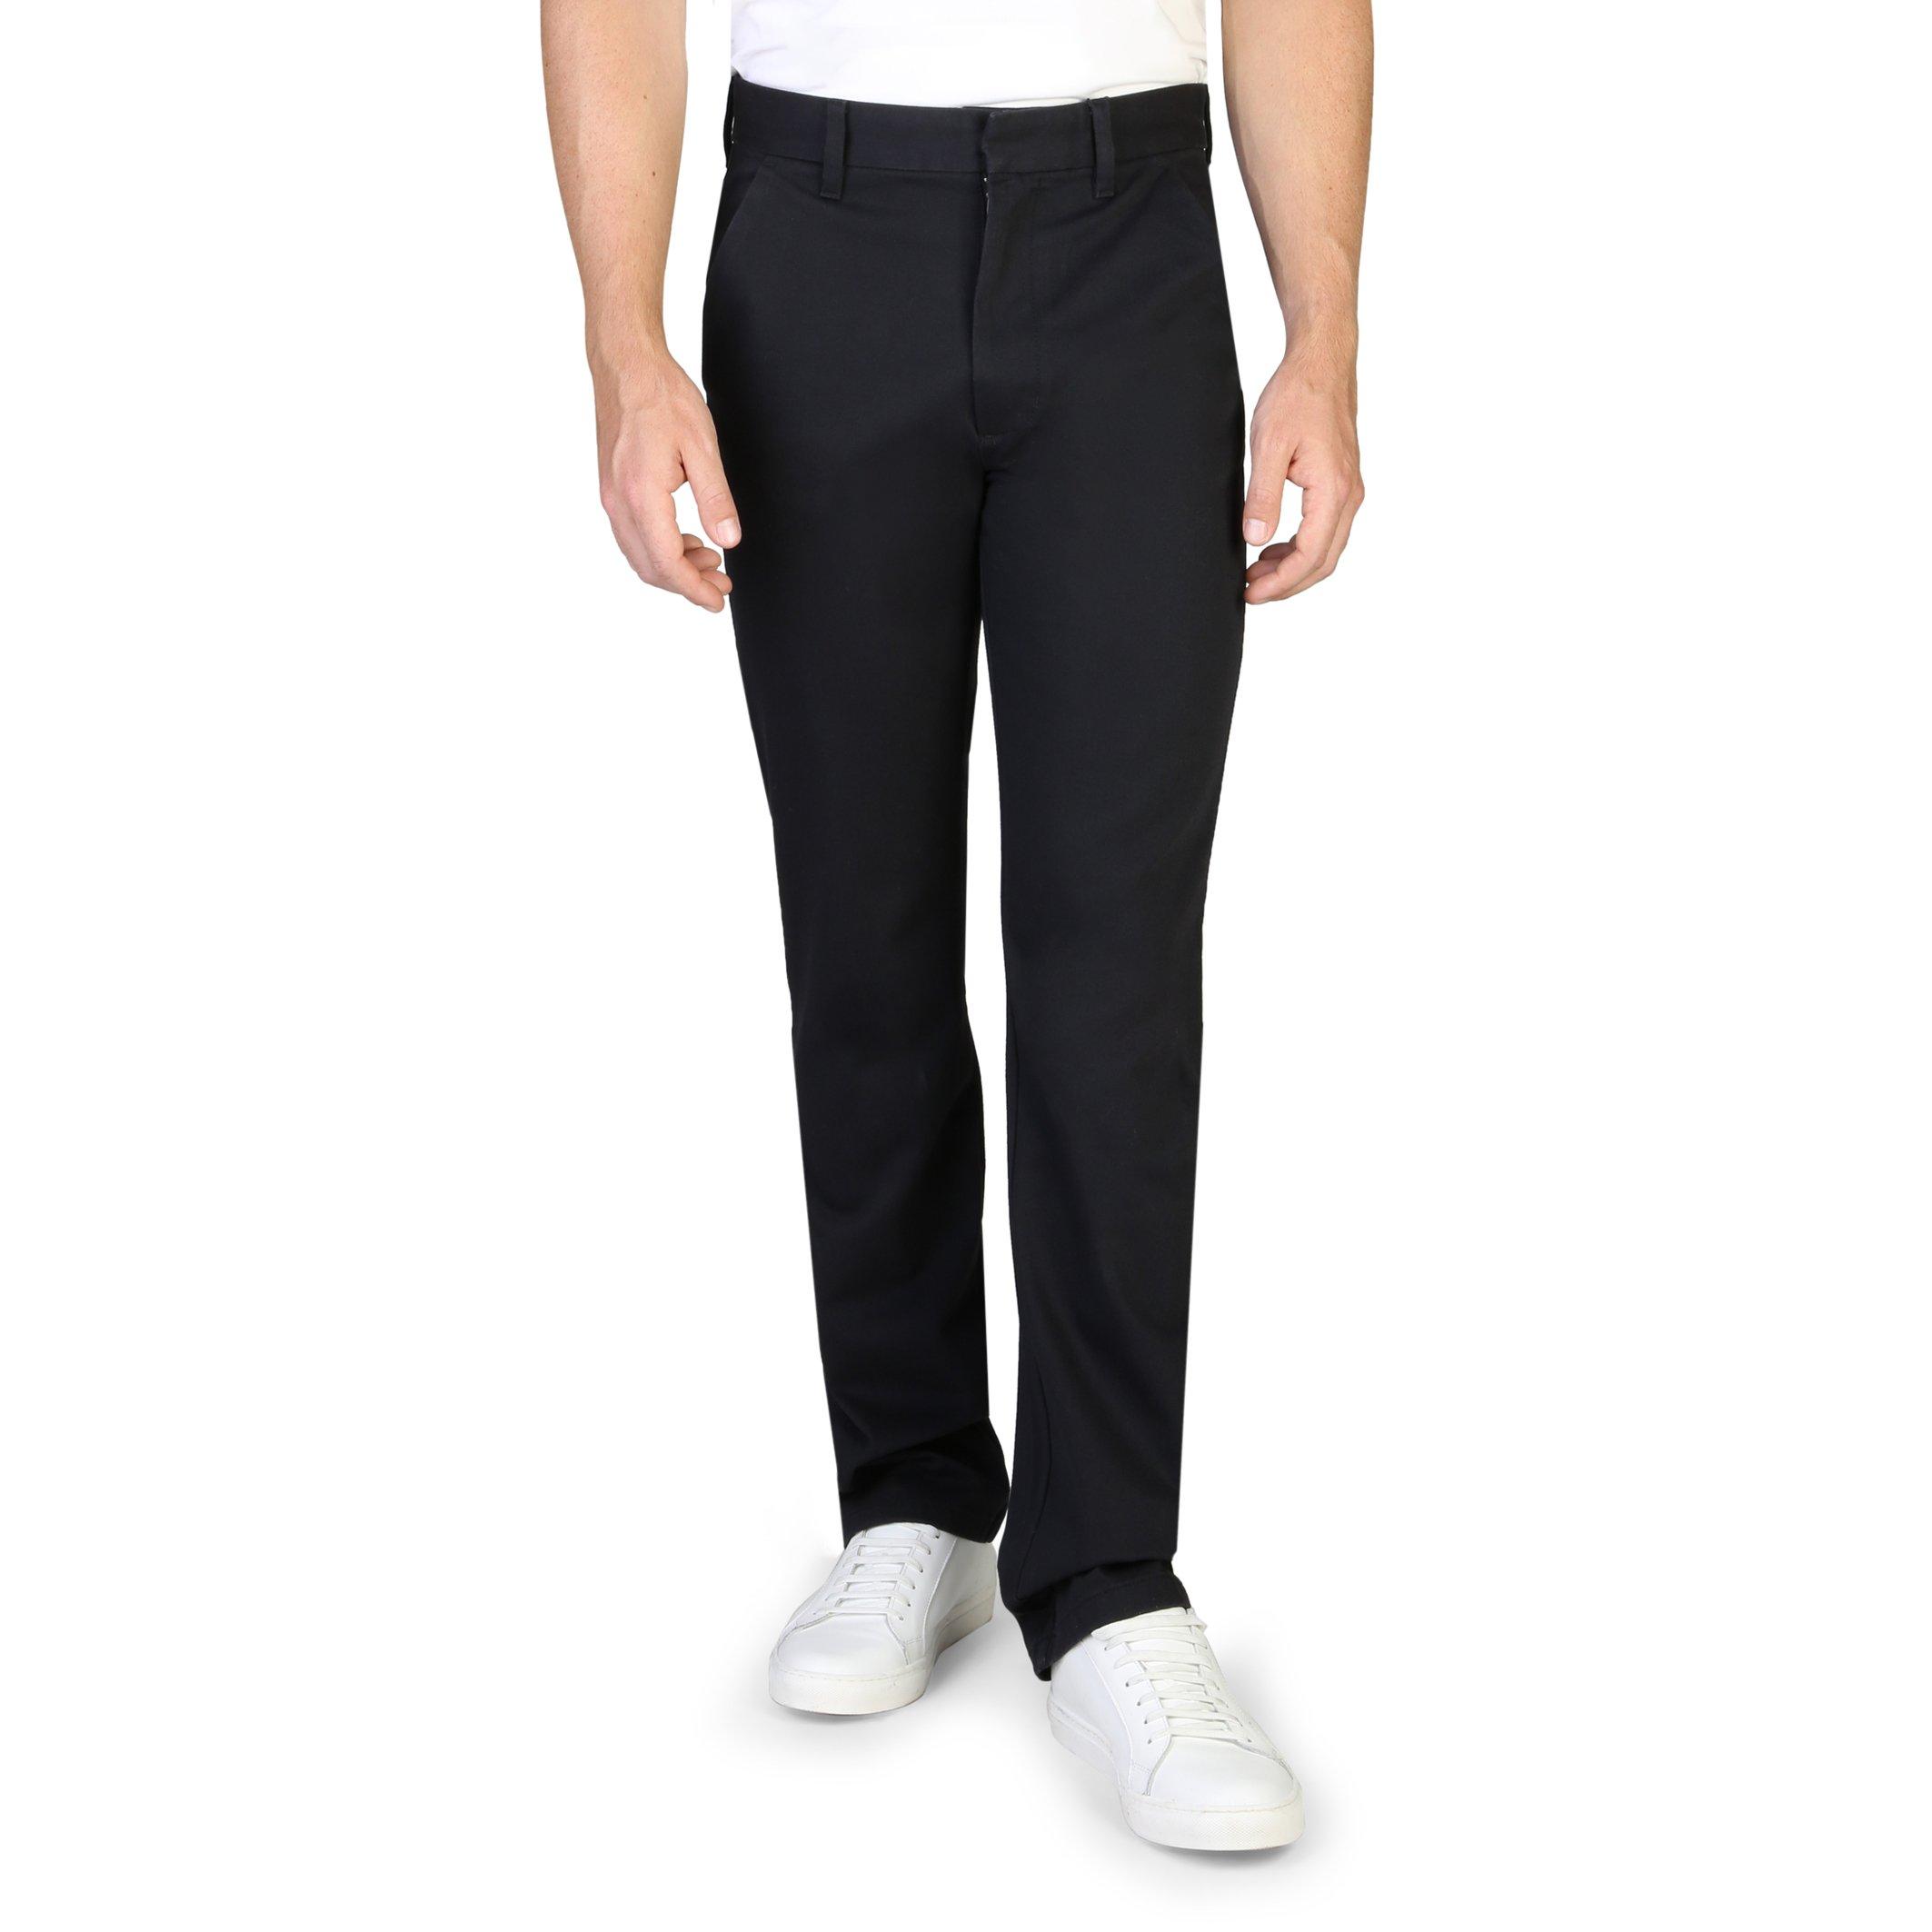 Calvin Klein Men's Jeans Black 350102 - black-1 31